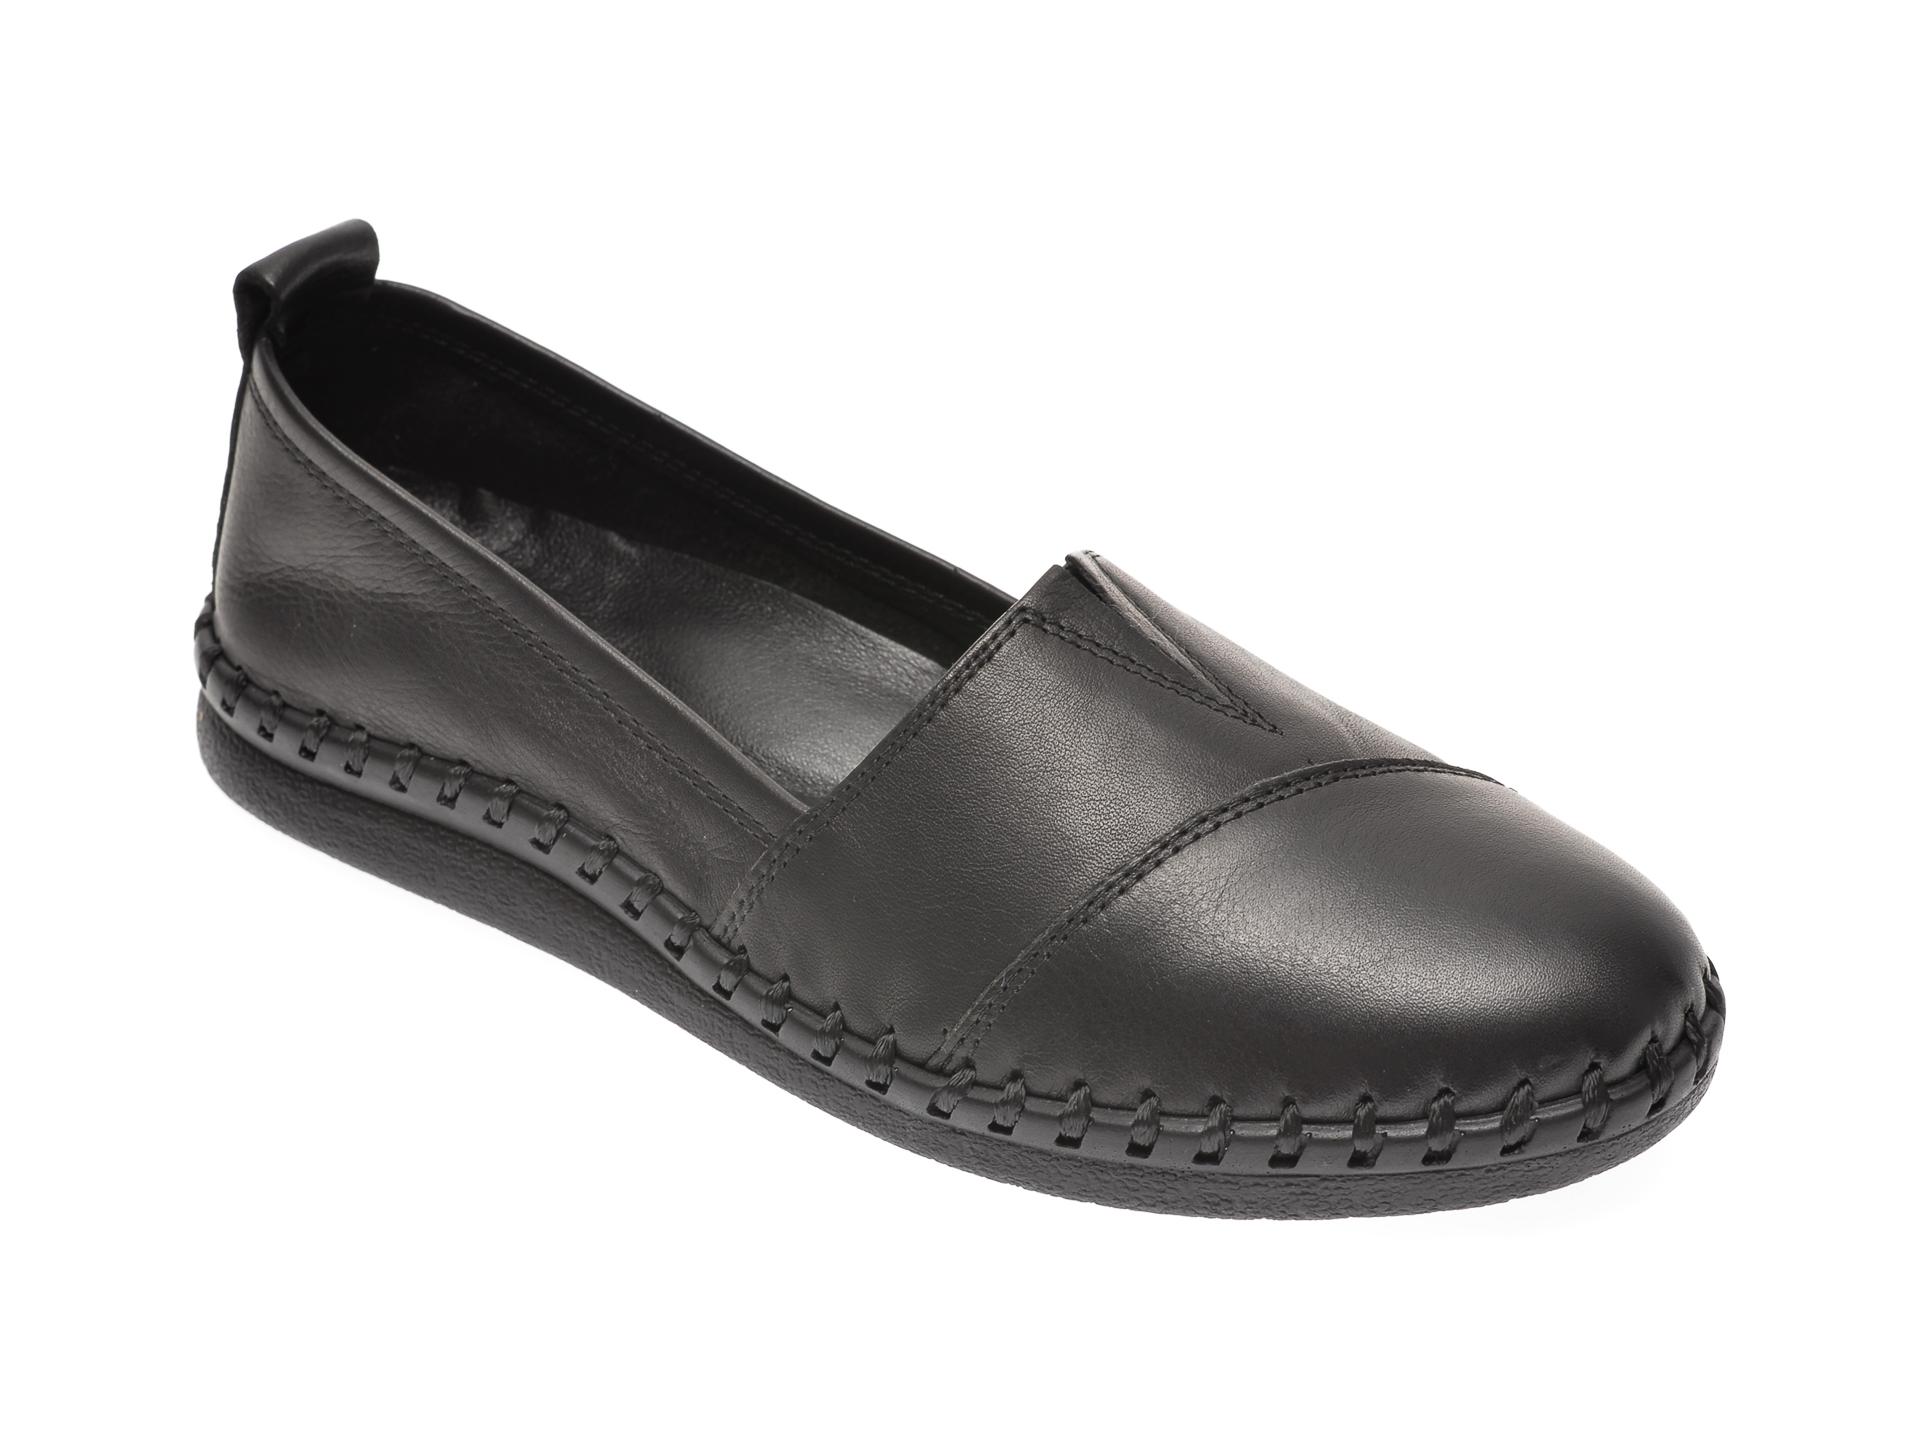 Pantofi CITY SIGN negri, 6016, din piele naturala New